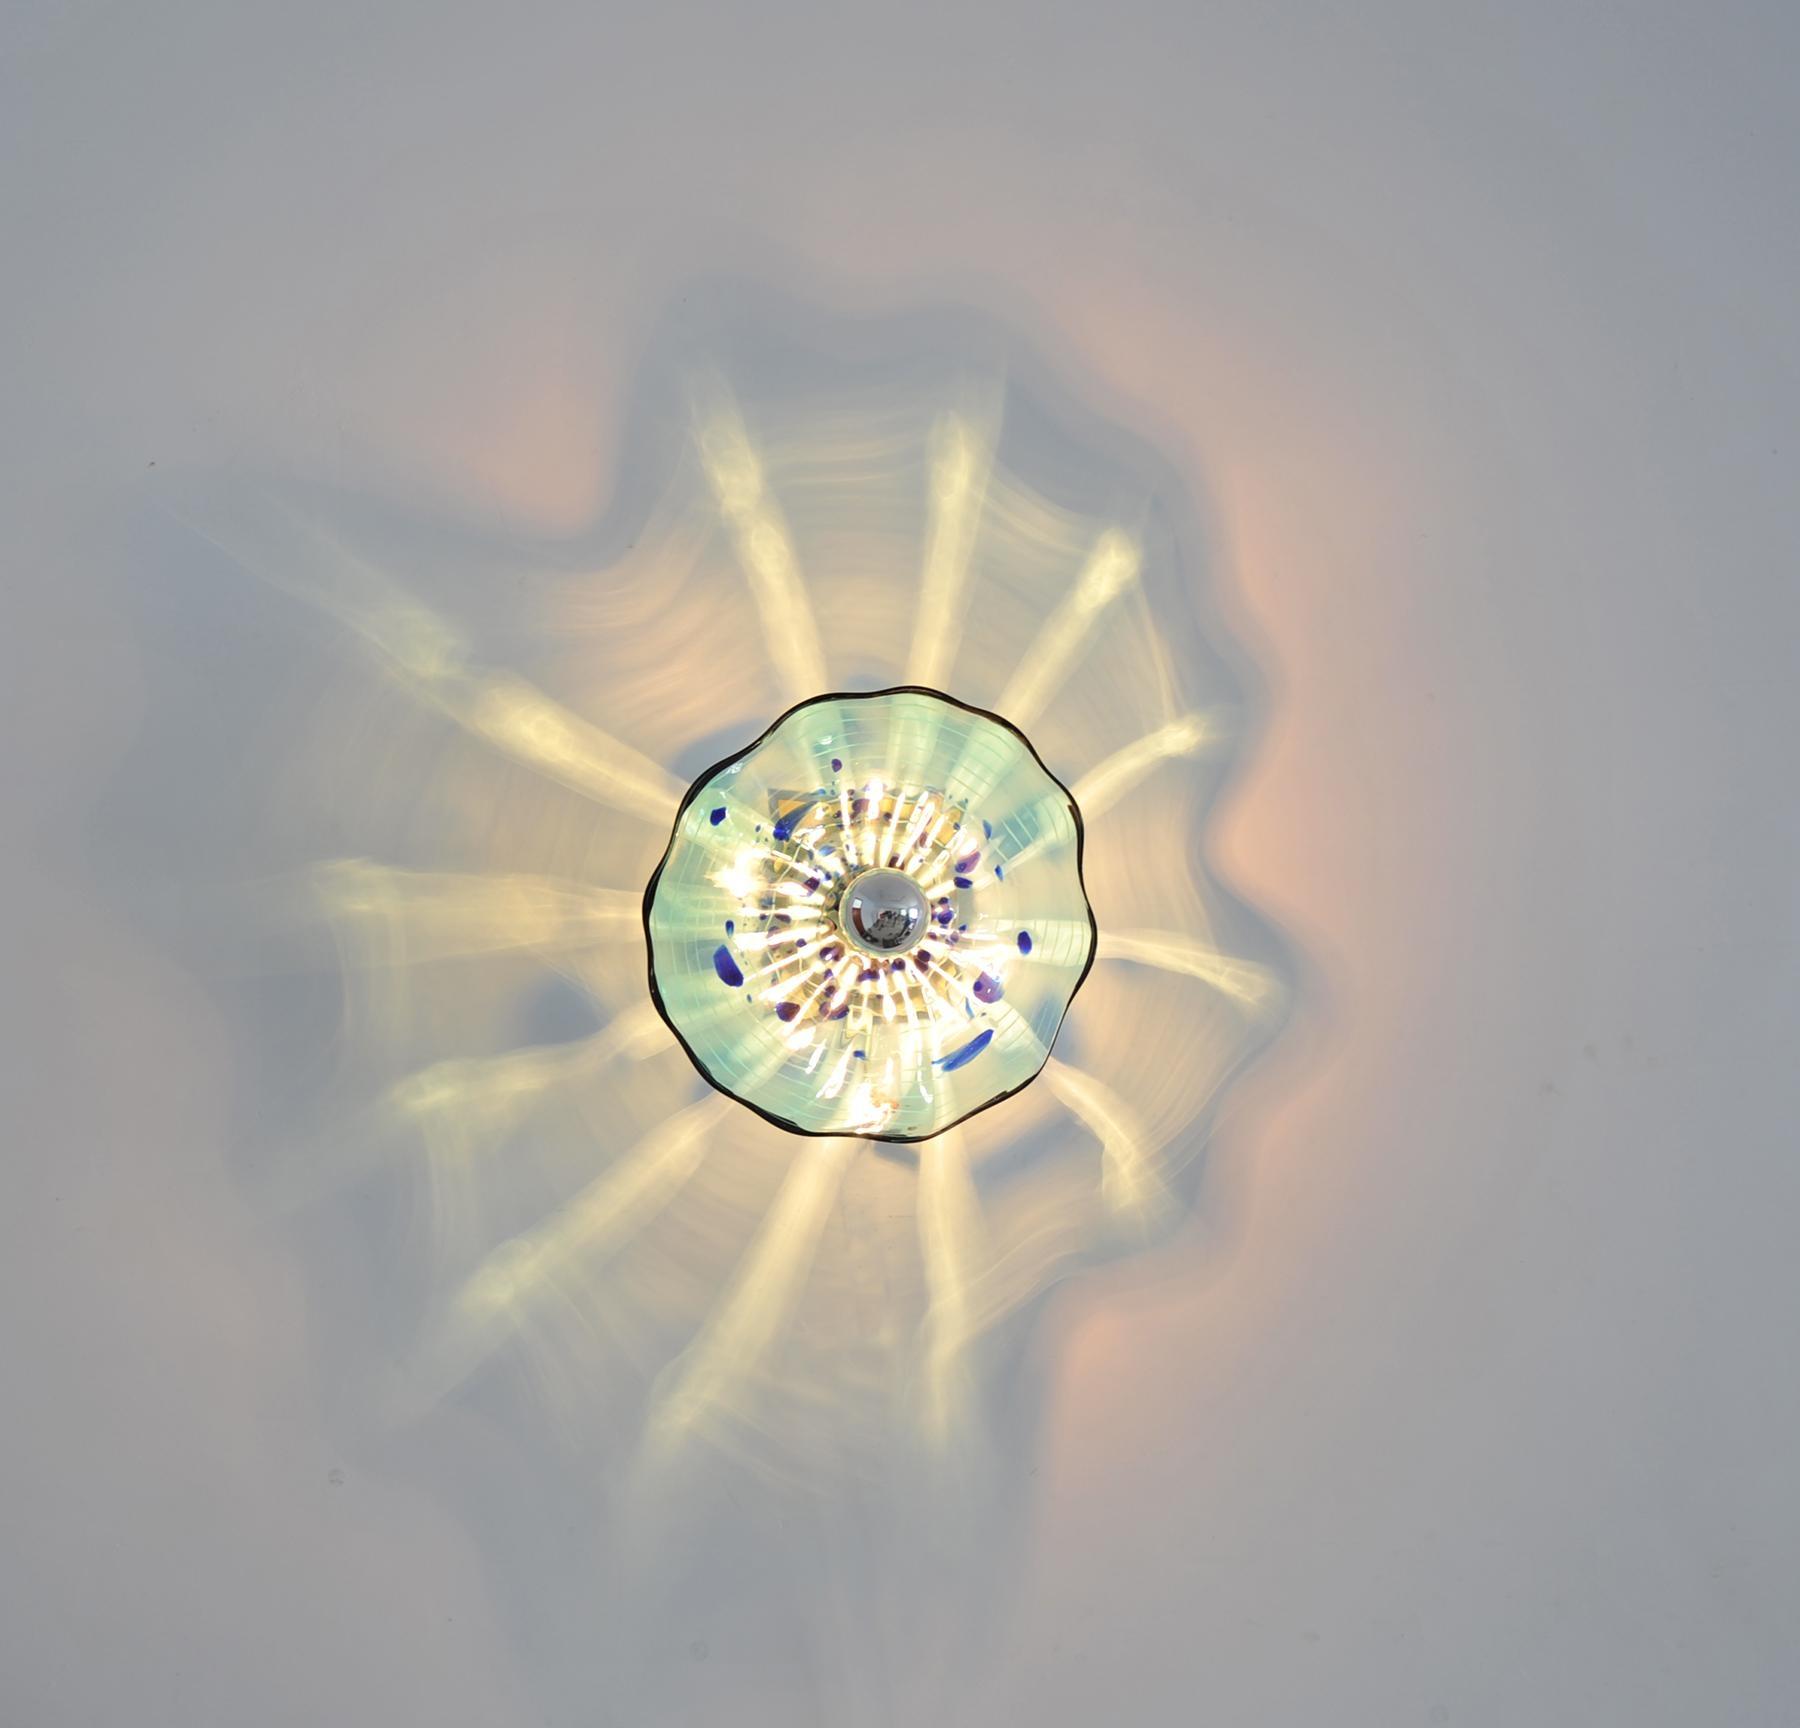 Wall Sconceviz Glass | Wir 4576Egs Throughout Viz Glass Wall Art (Image 19 of 20)